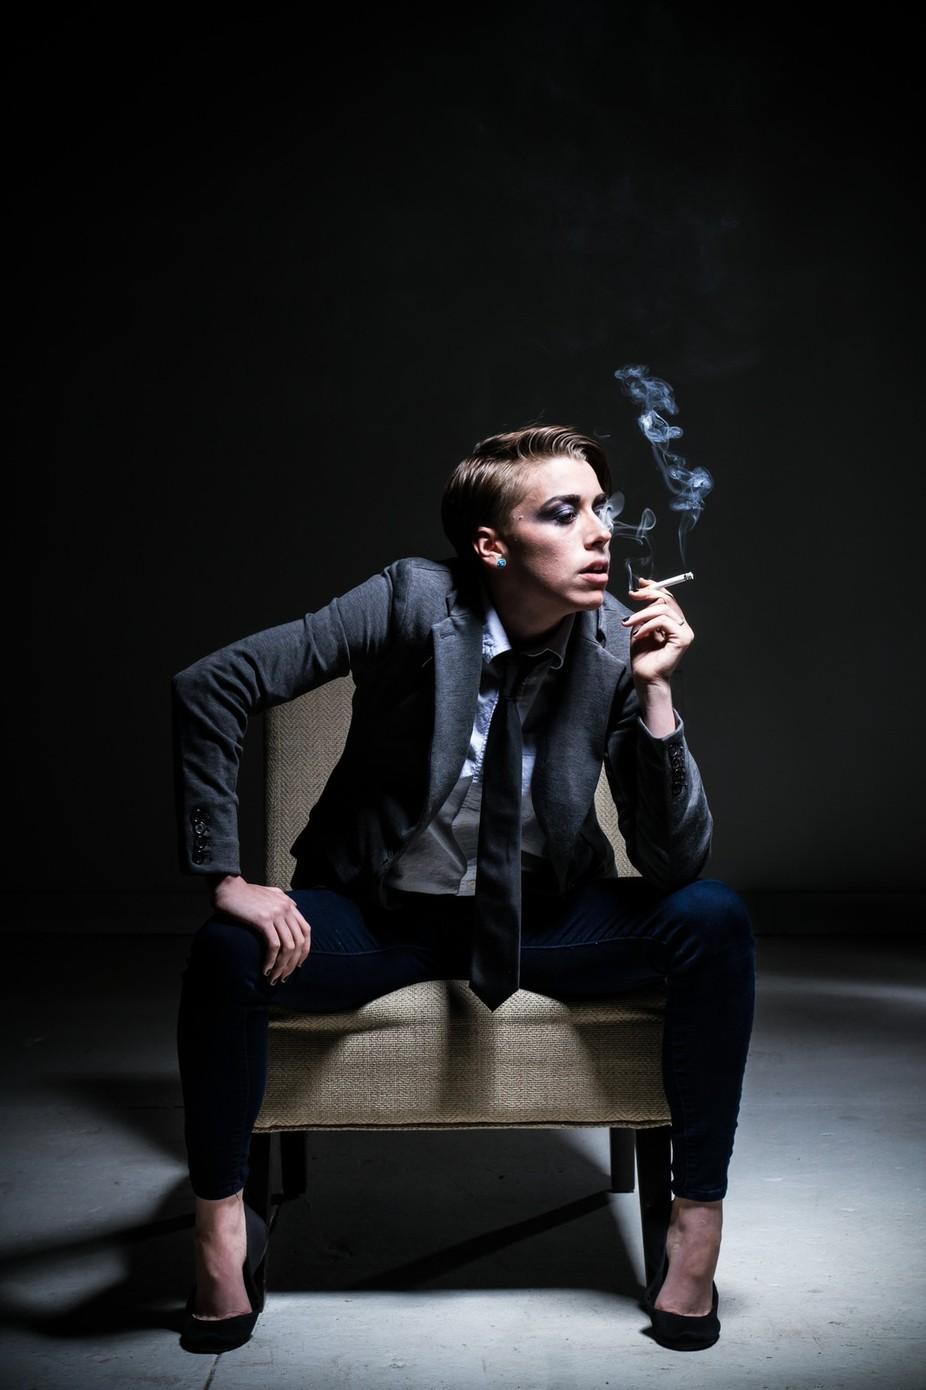 Smoke Break by rueromani - Everything Smoke Photo Contest